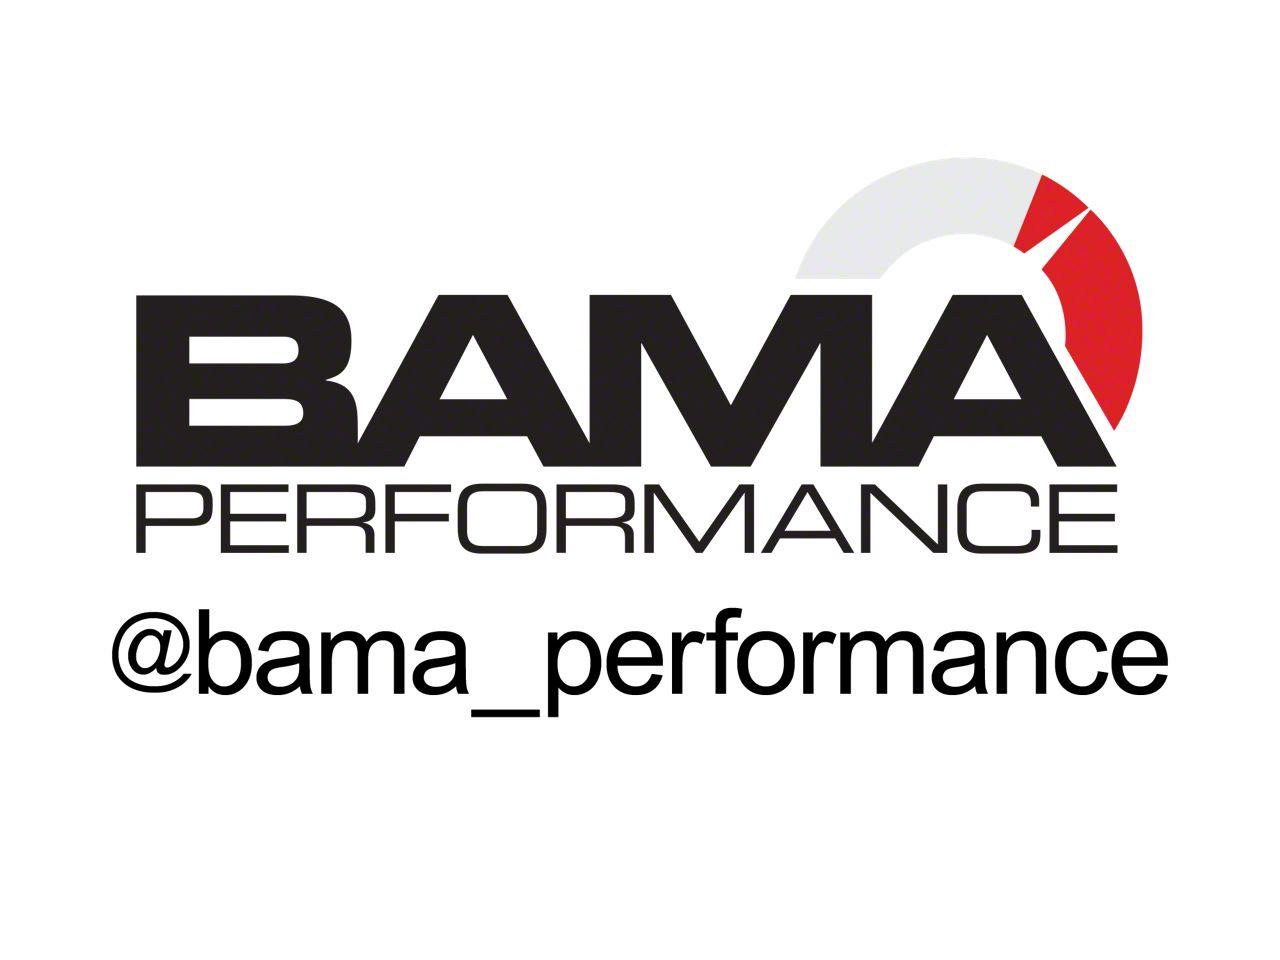 Bama Mustang Bdx Tuner W 2 Custom Tunes 397468 15 17 Gt Free